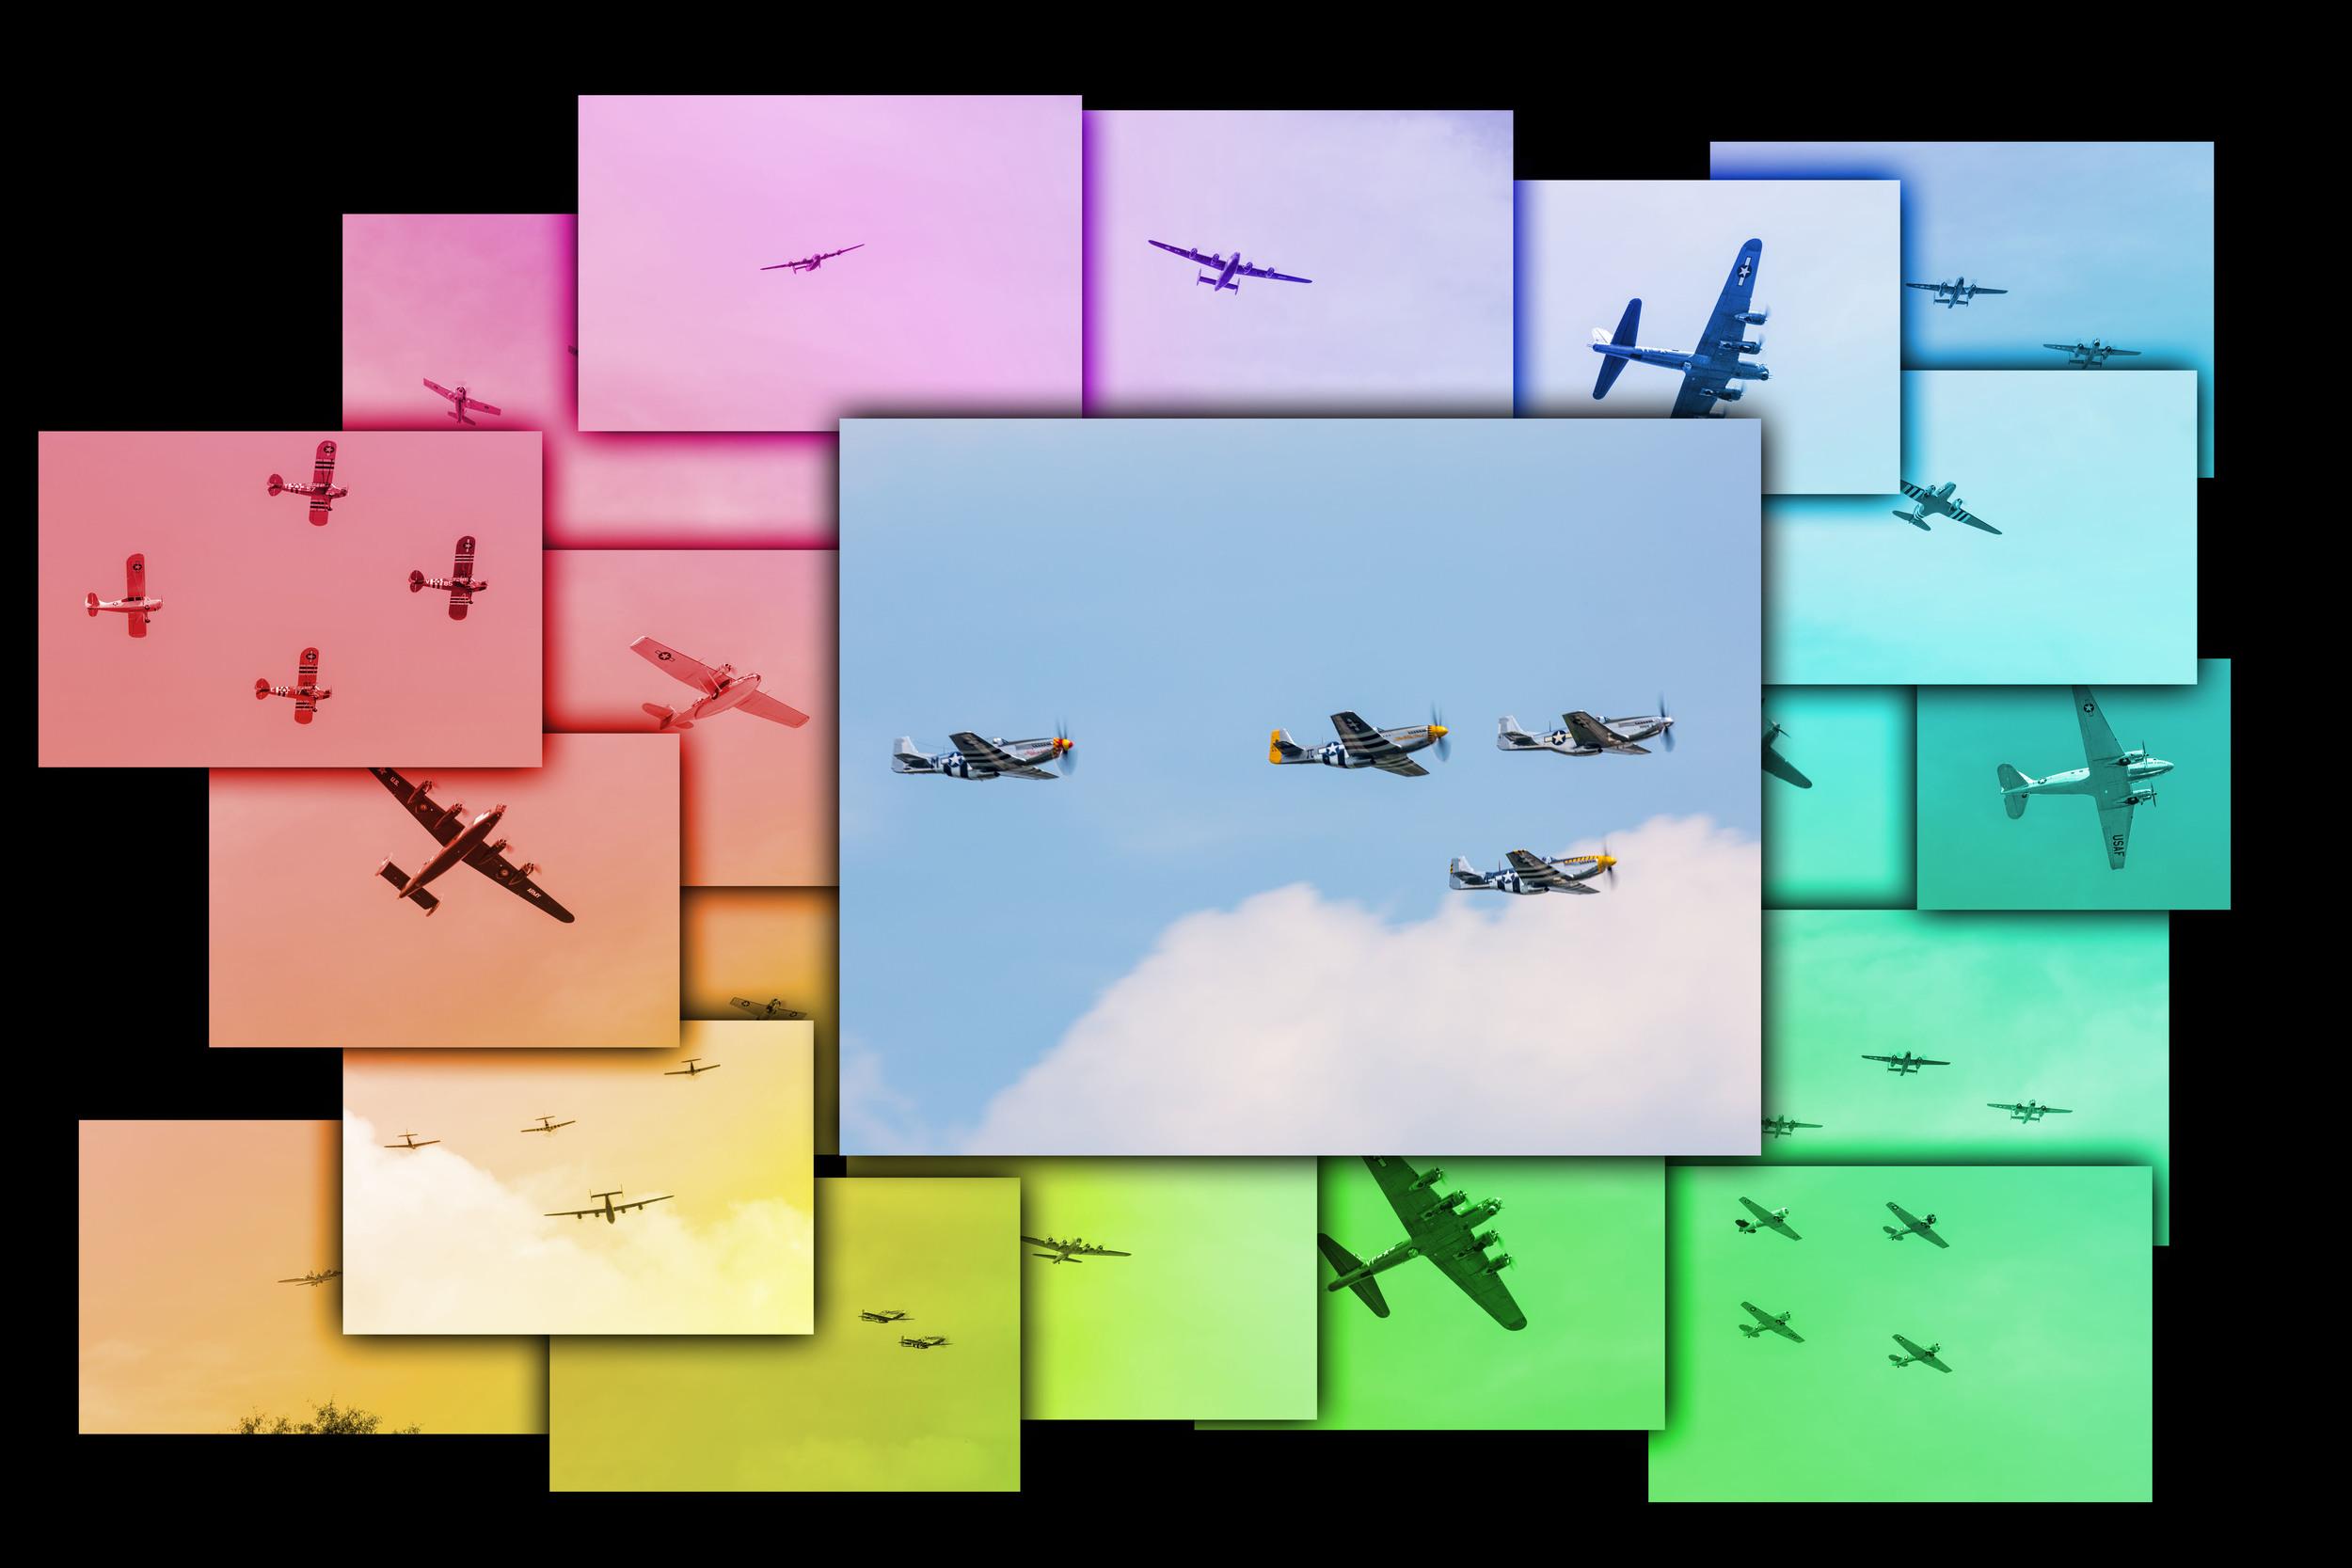 World War 2 flyover